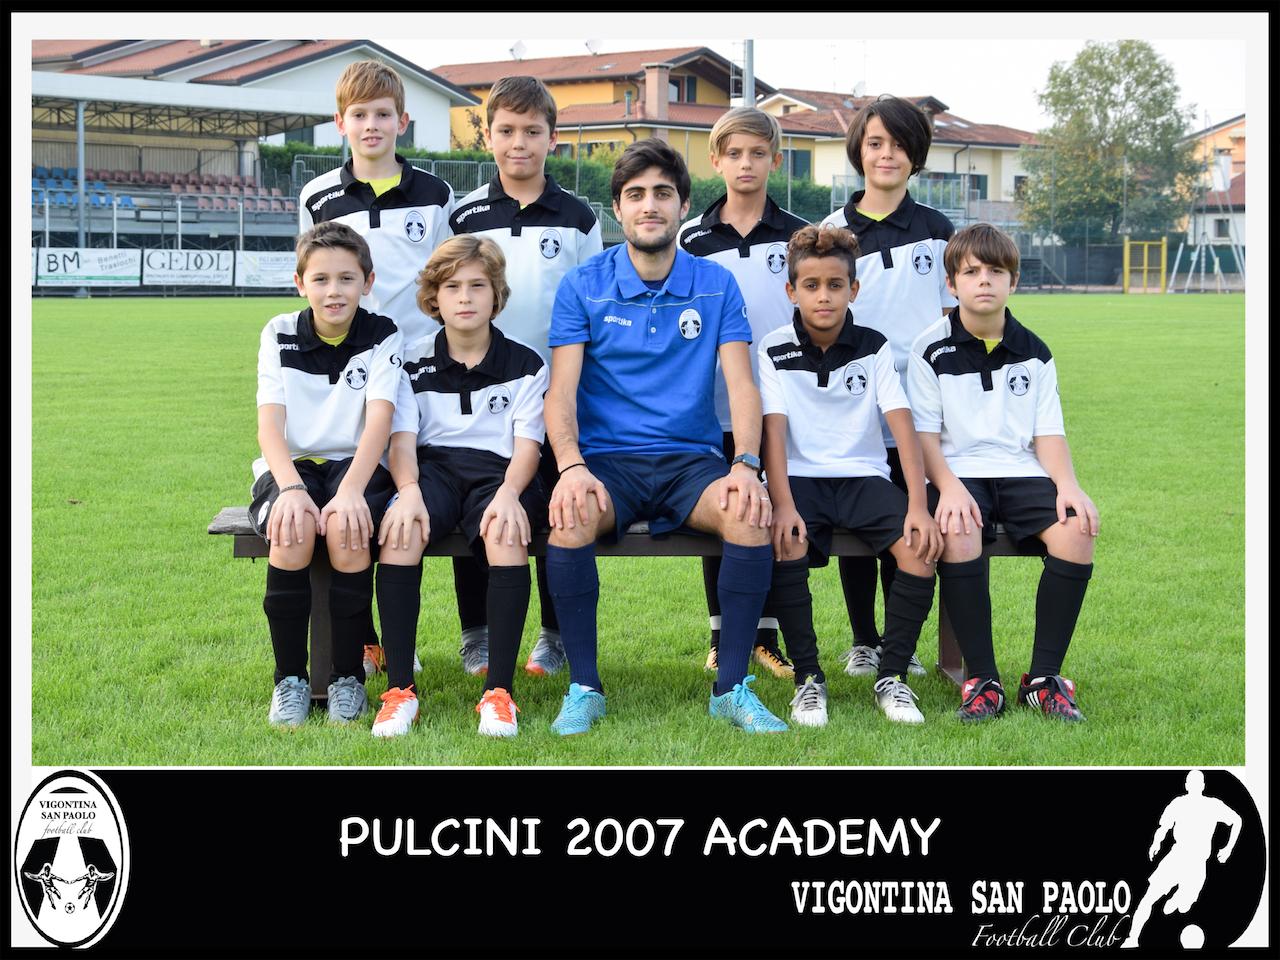 2007-Pulcini-Academy-2